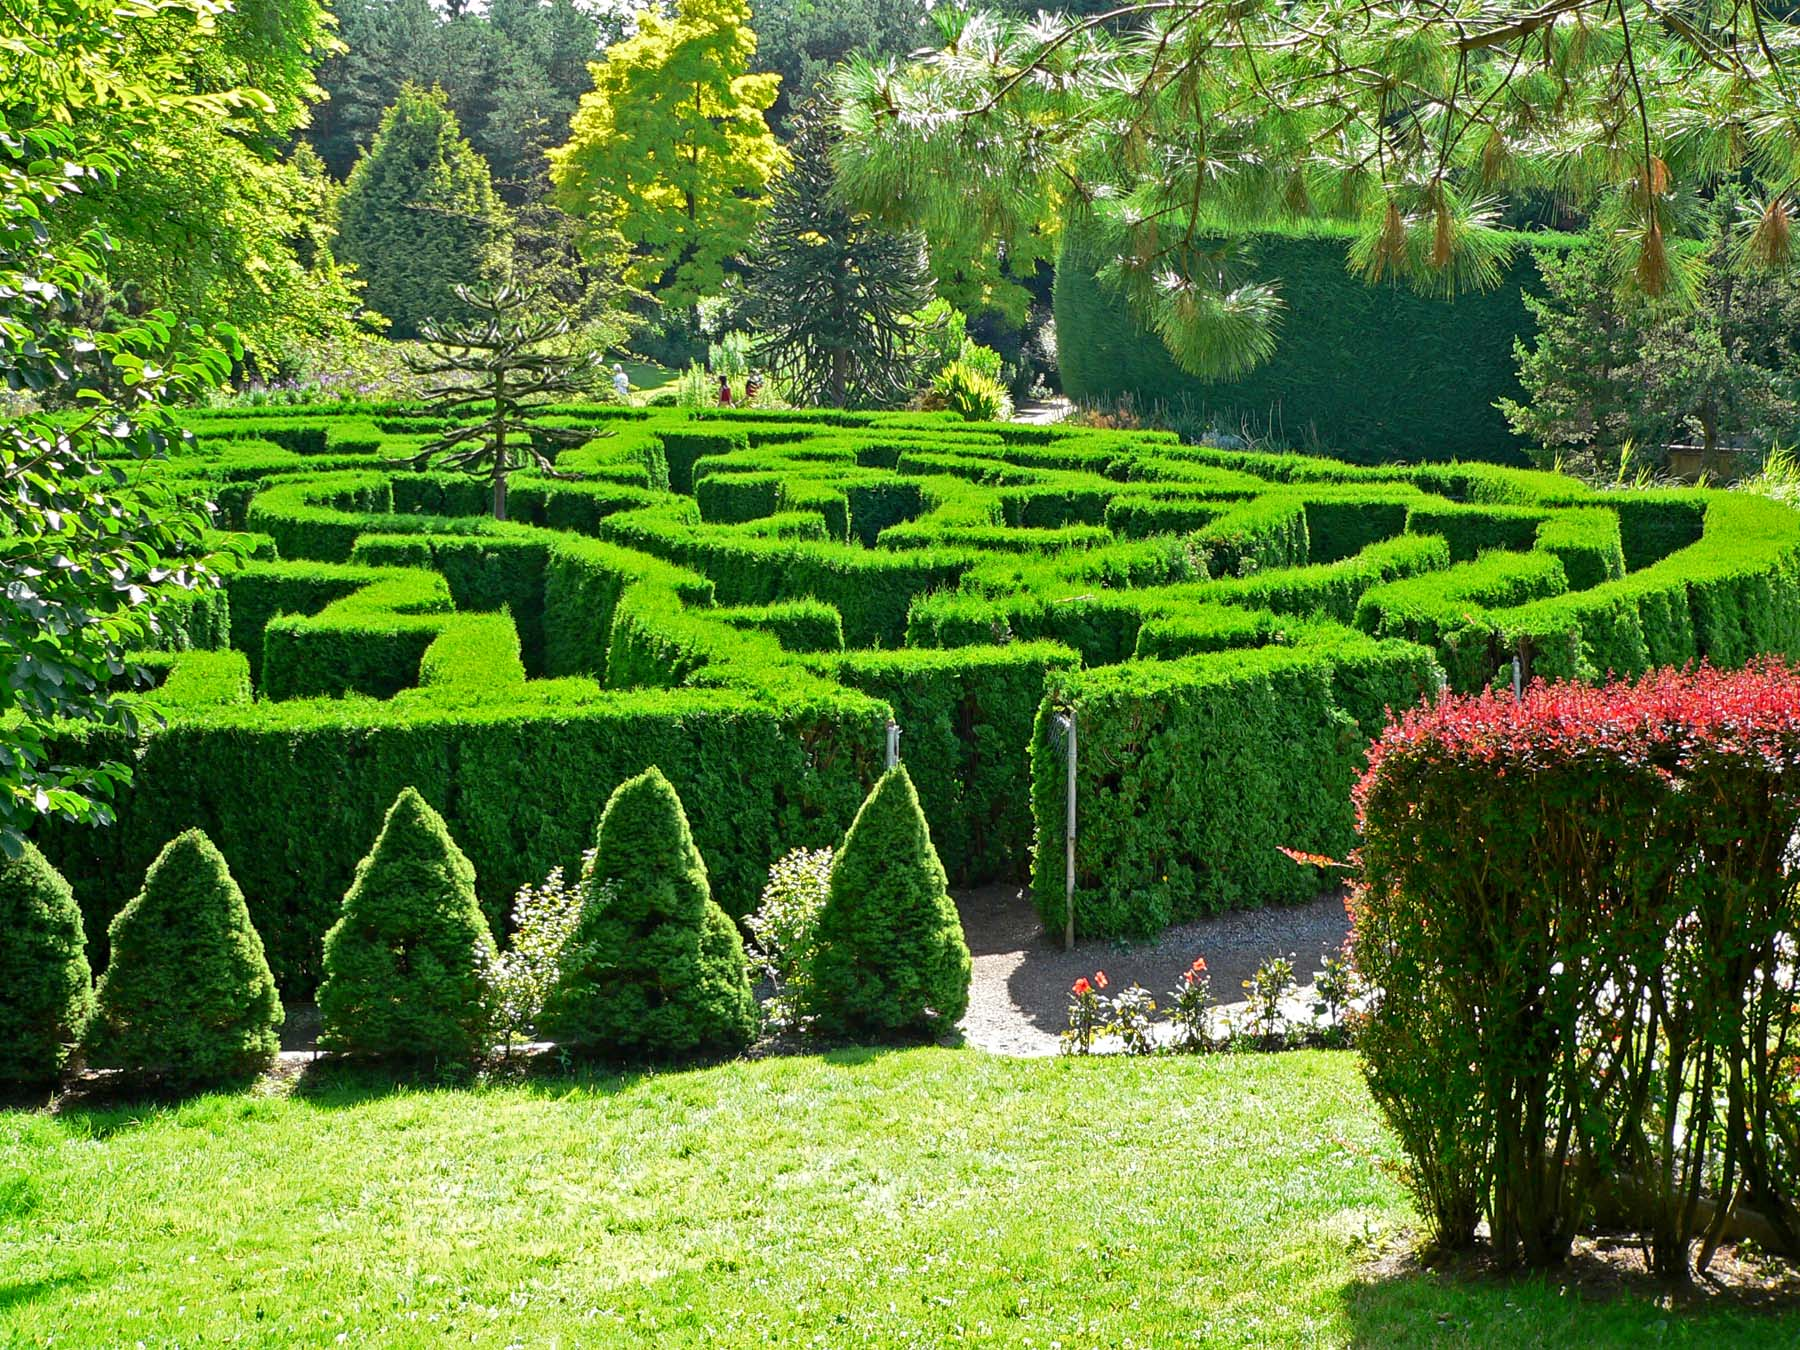 Labyrinth On Pinterest Labyrinths Hedges And Labyrinth